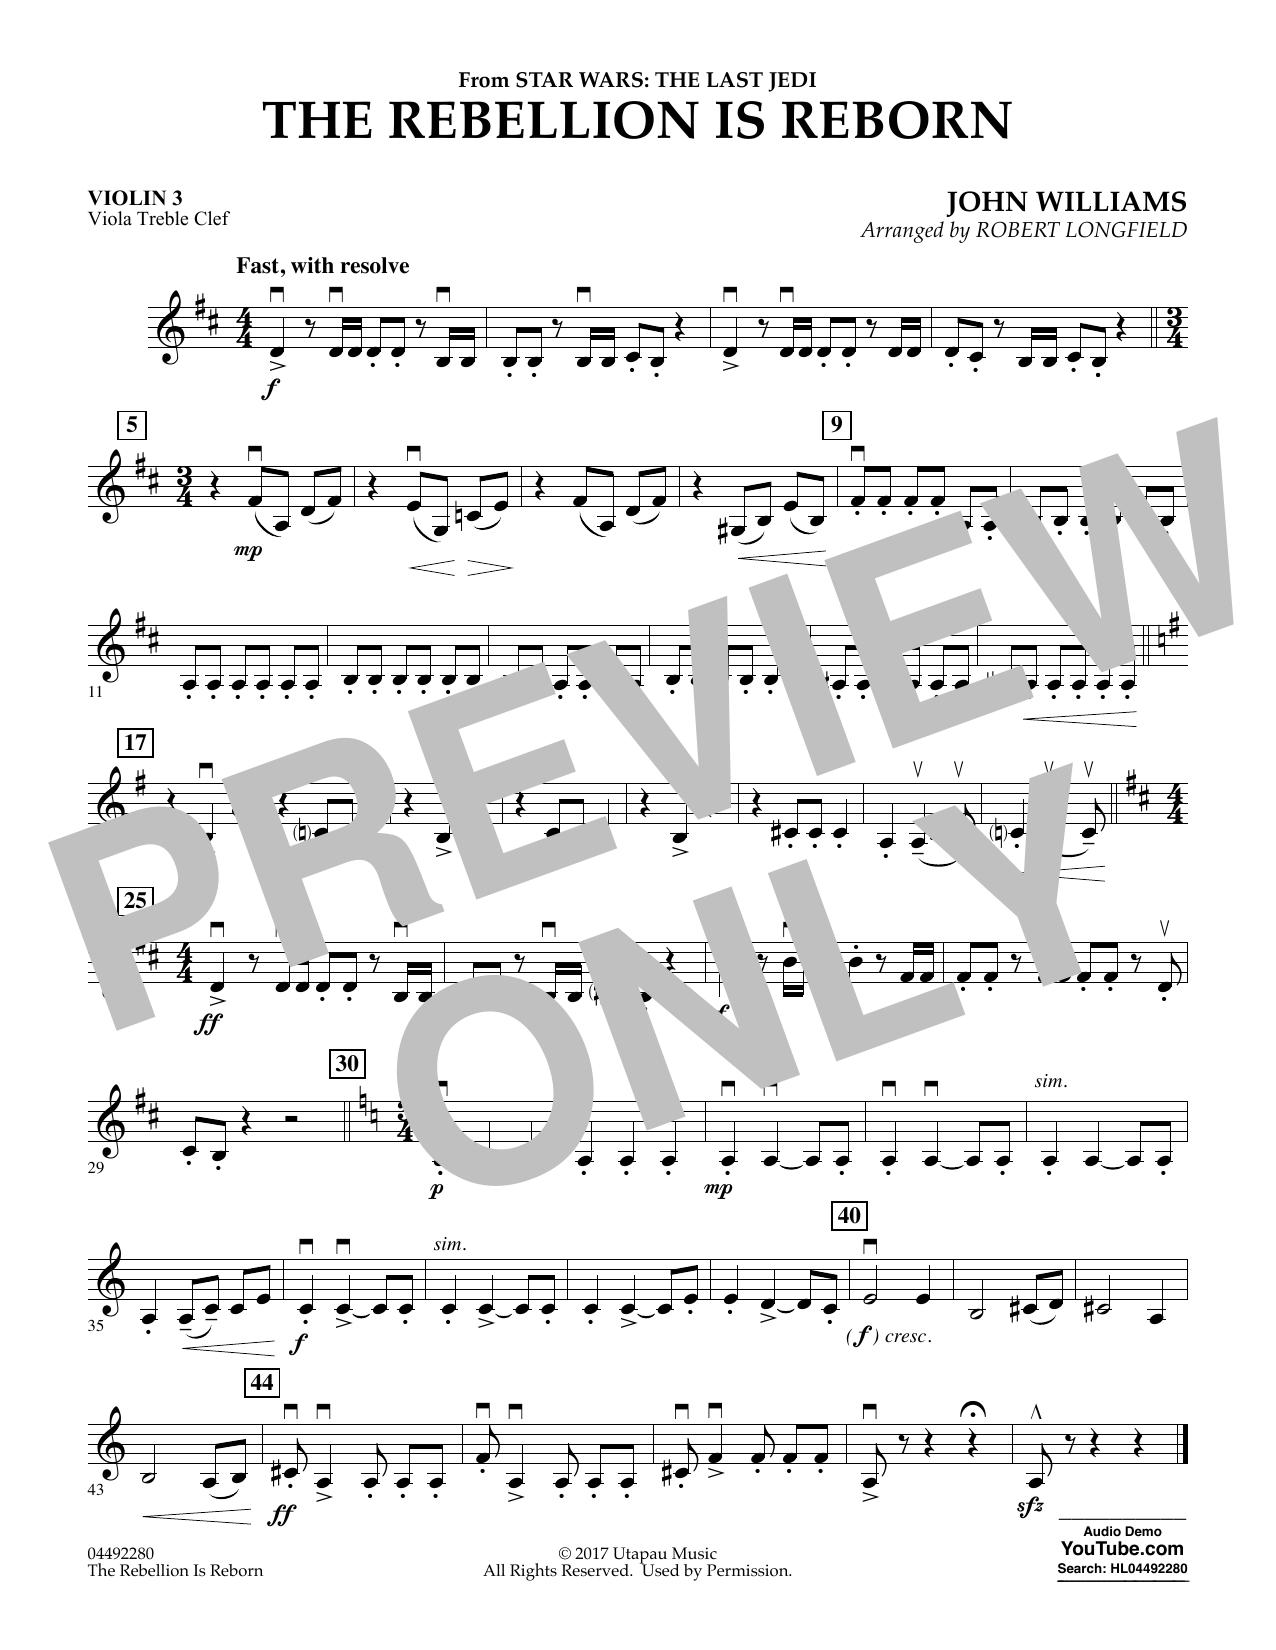 The Rebellion Is Reborn (from Star Wars: The Last Jedi) - Violin 3 (Viola T.C.) (Orchestra)